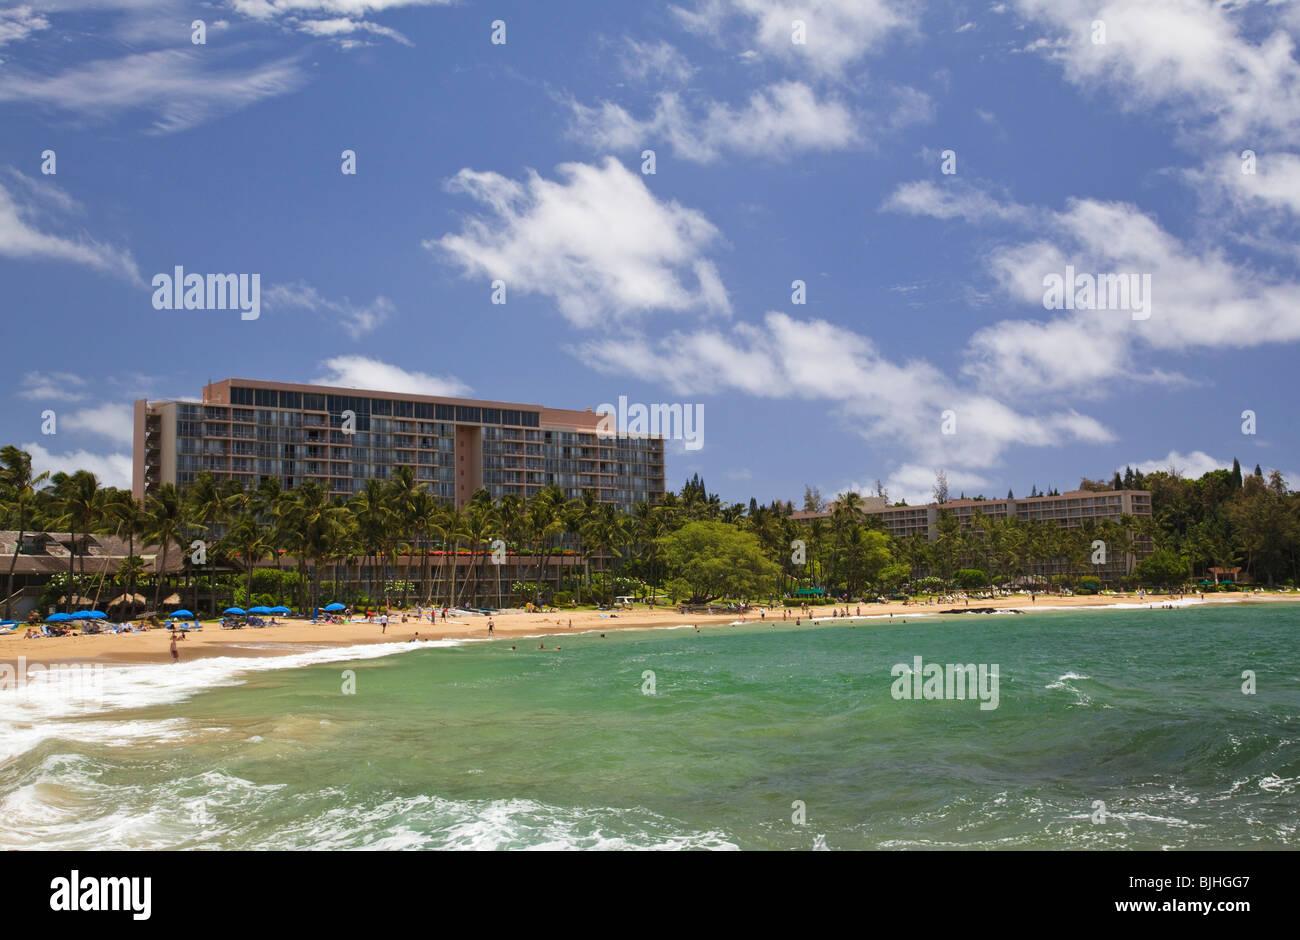 Marriott hotel and kalapaki beach on nawiliwili bay lihue kauai hawaii